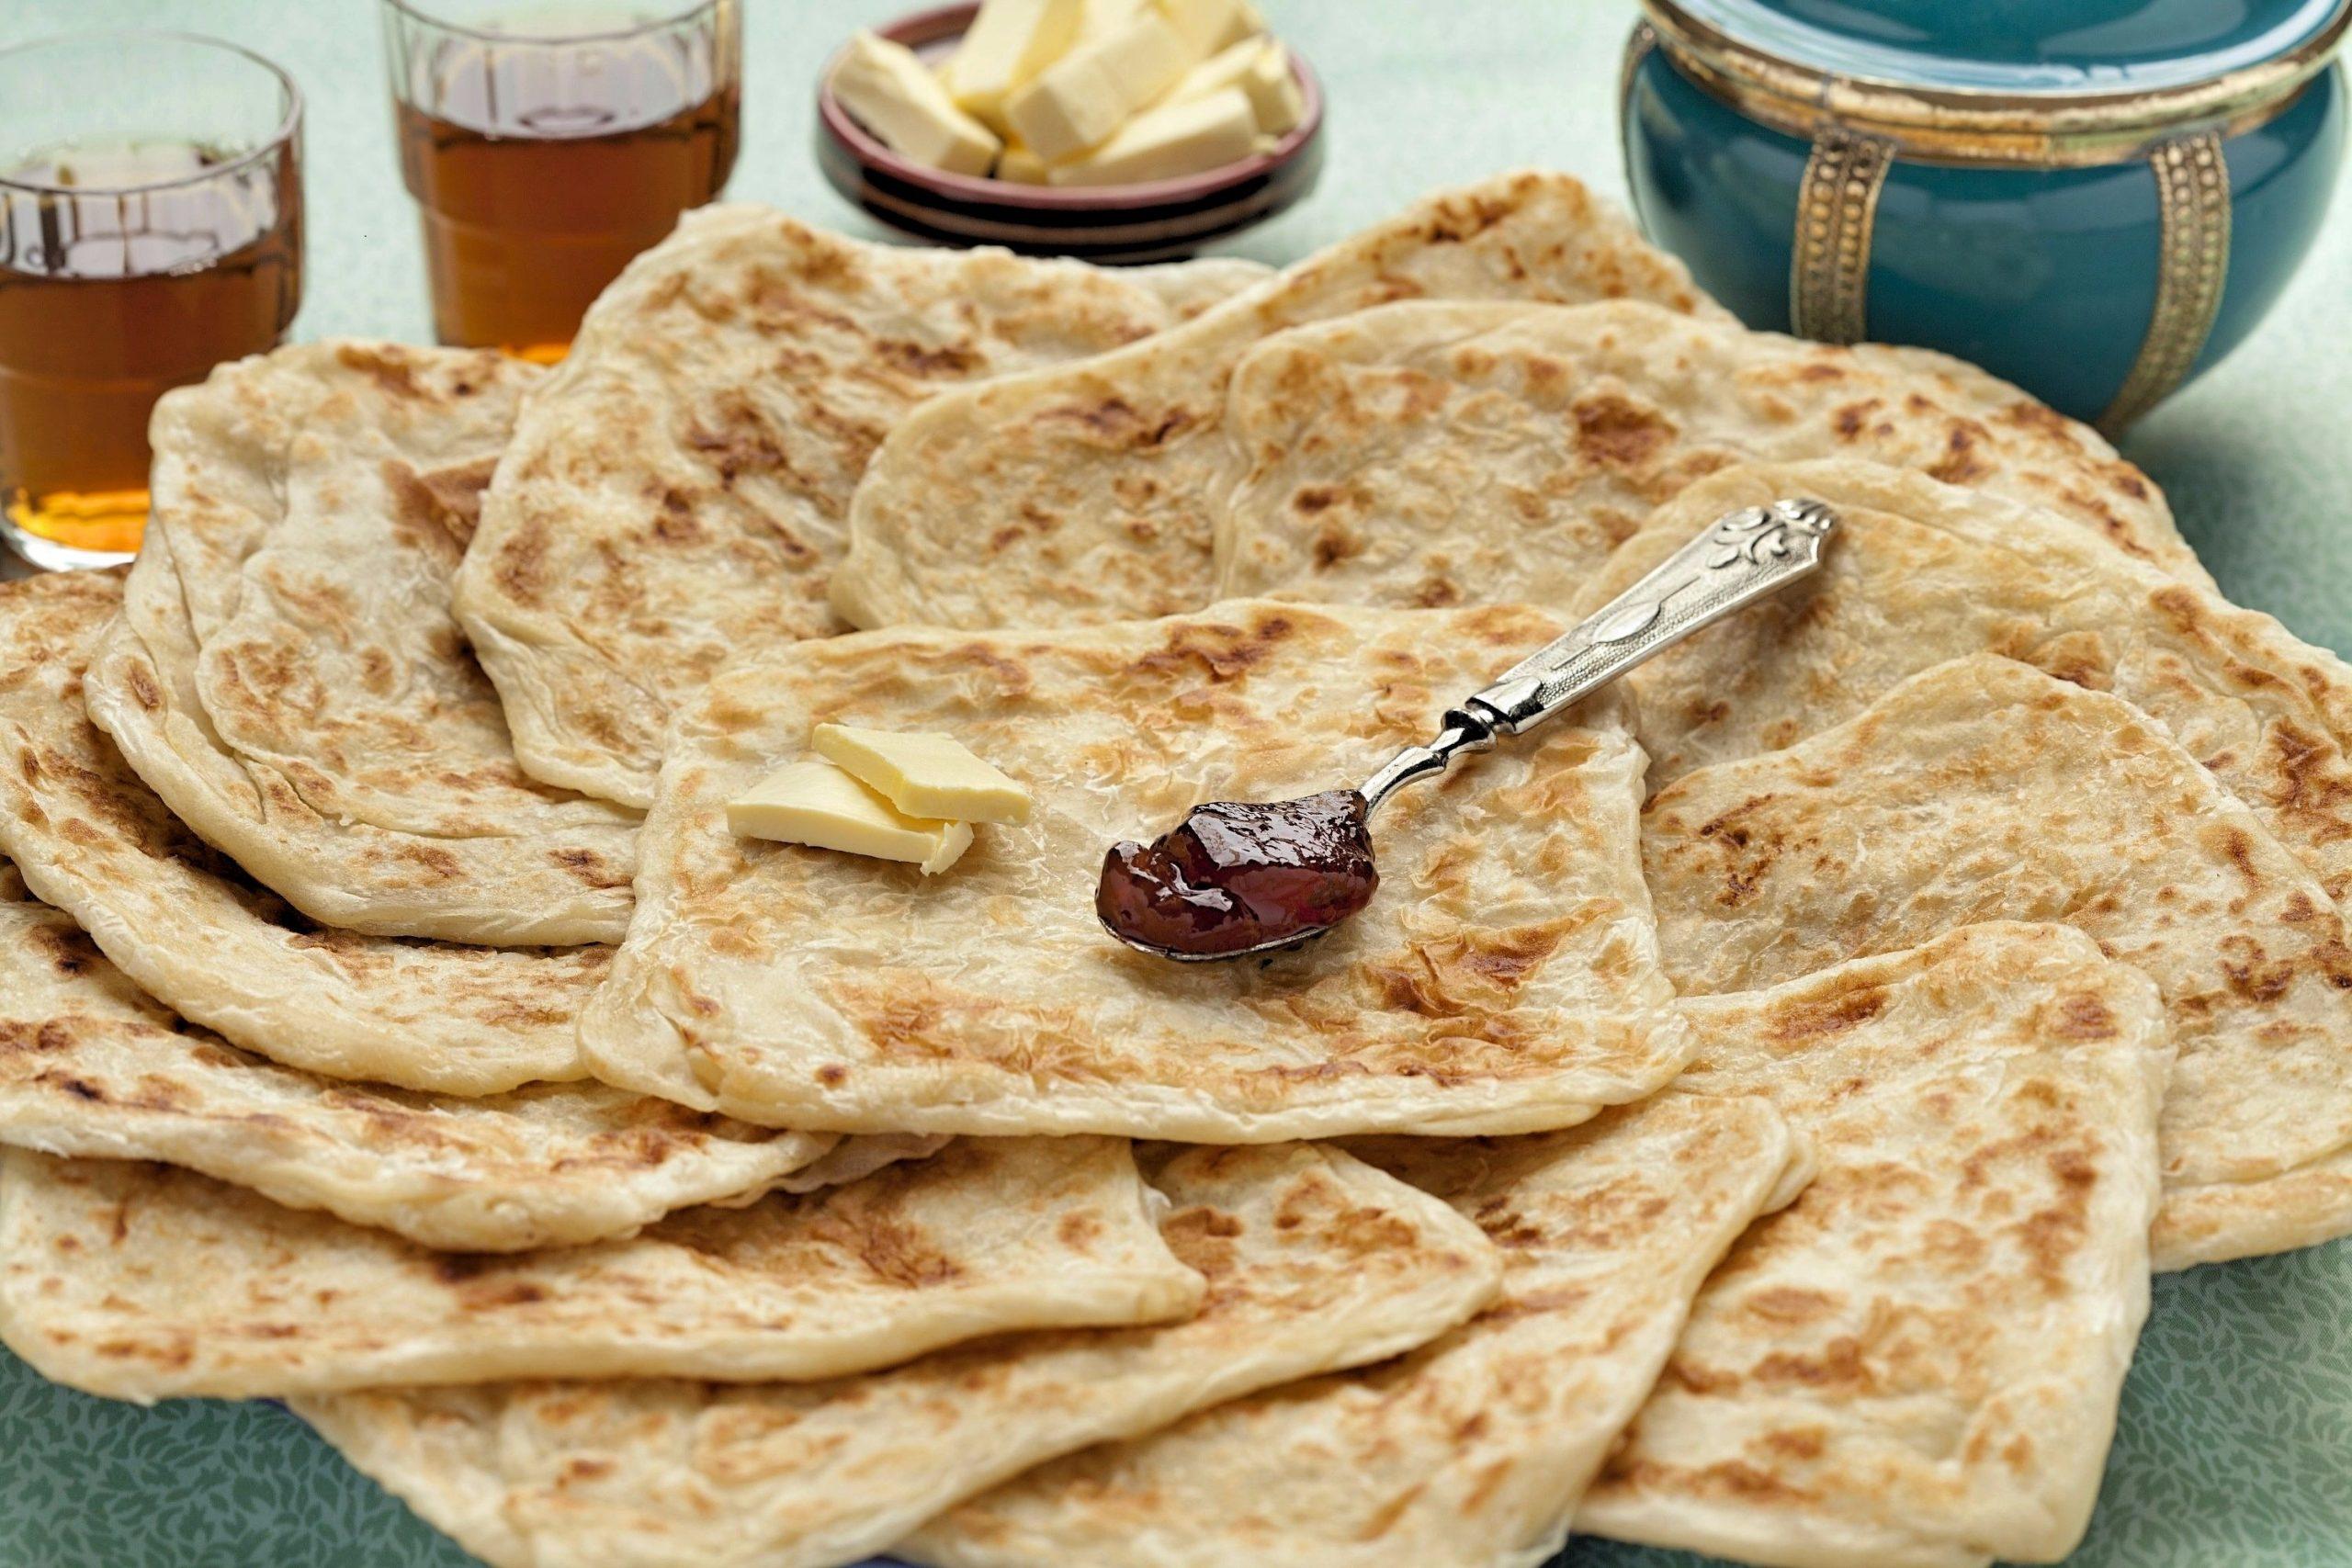 Tunisian snacks, Traditional Tunisian snacks and desserts, Tunisia snacks, Tunisia desserts, traditional snacks and desserts in Tunisia, Tunisian desserts, msemen